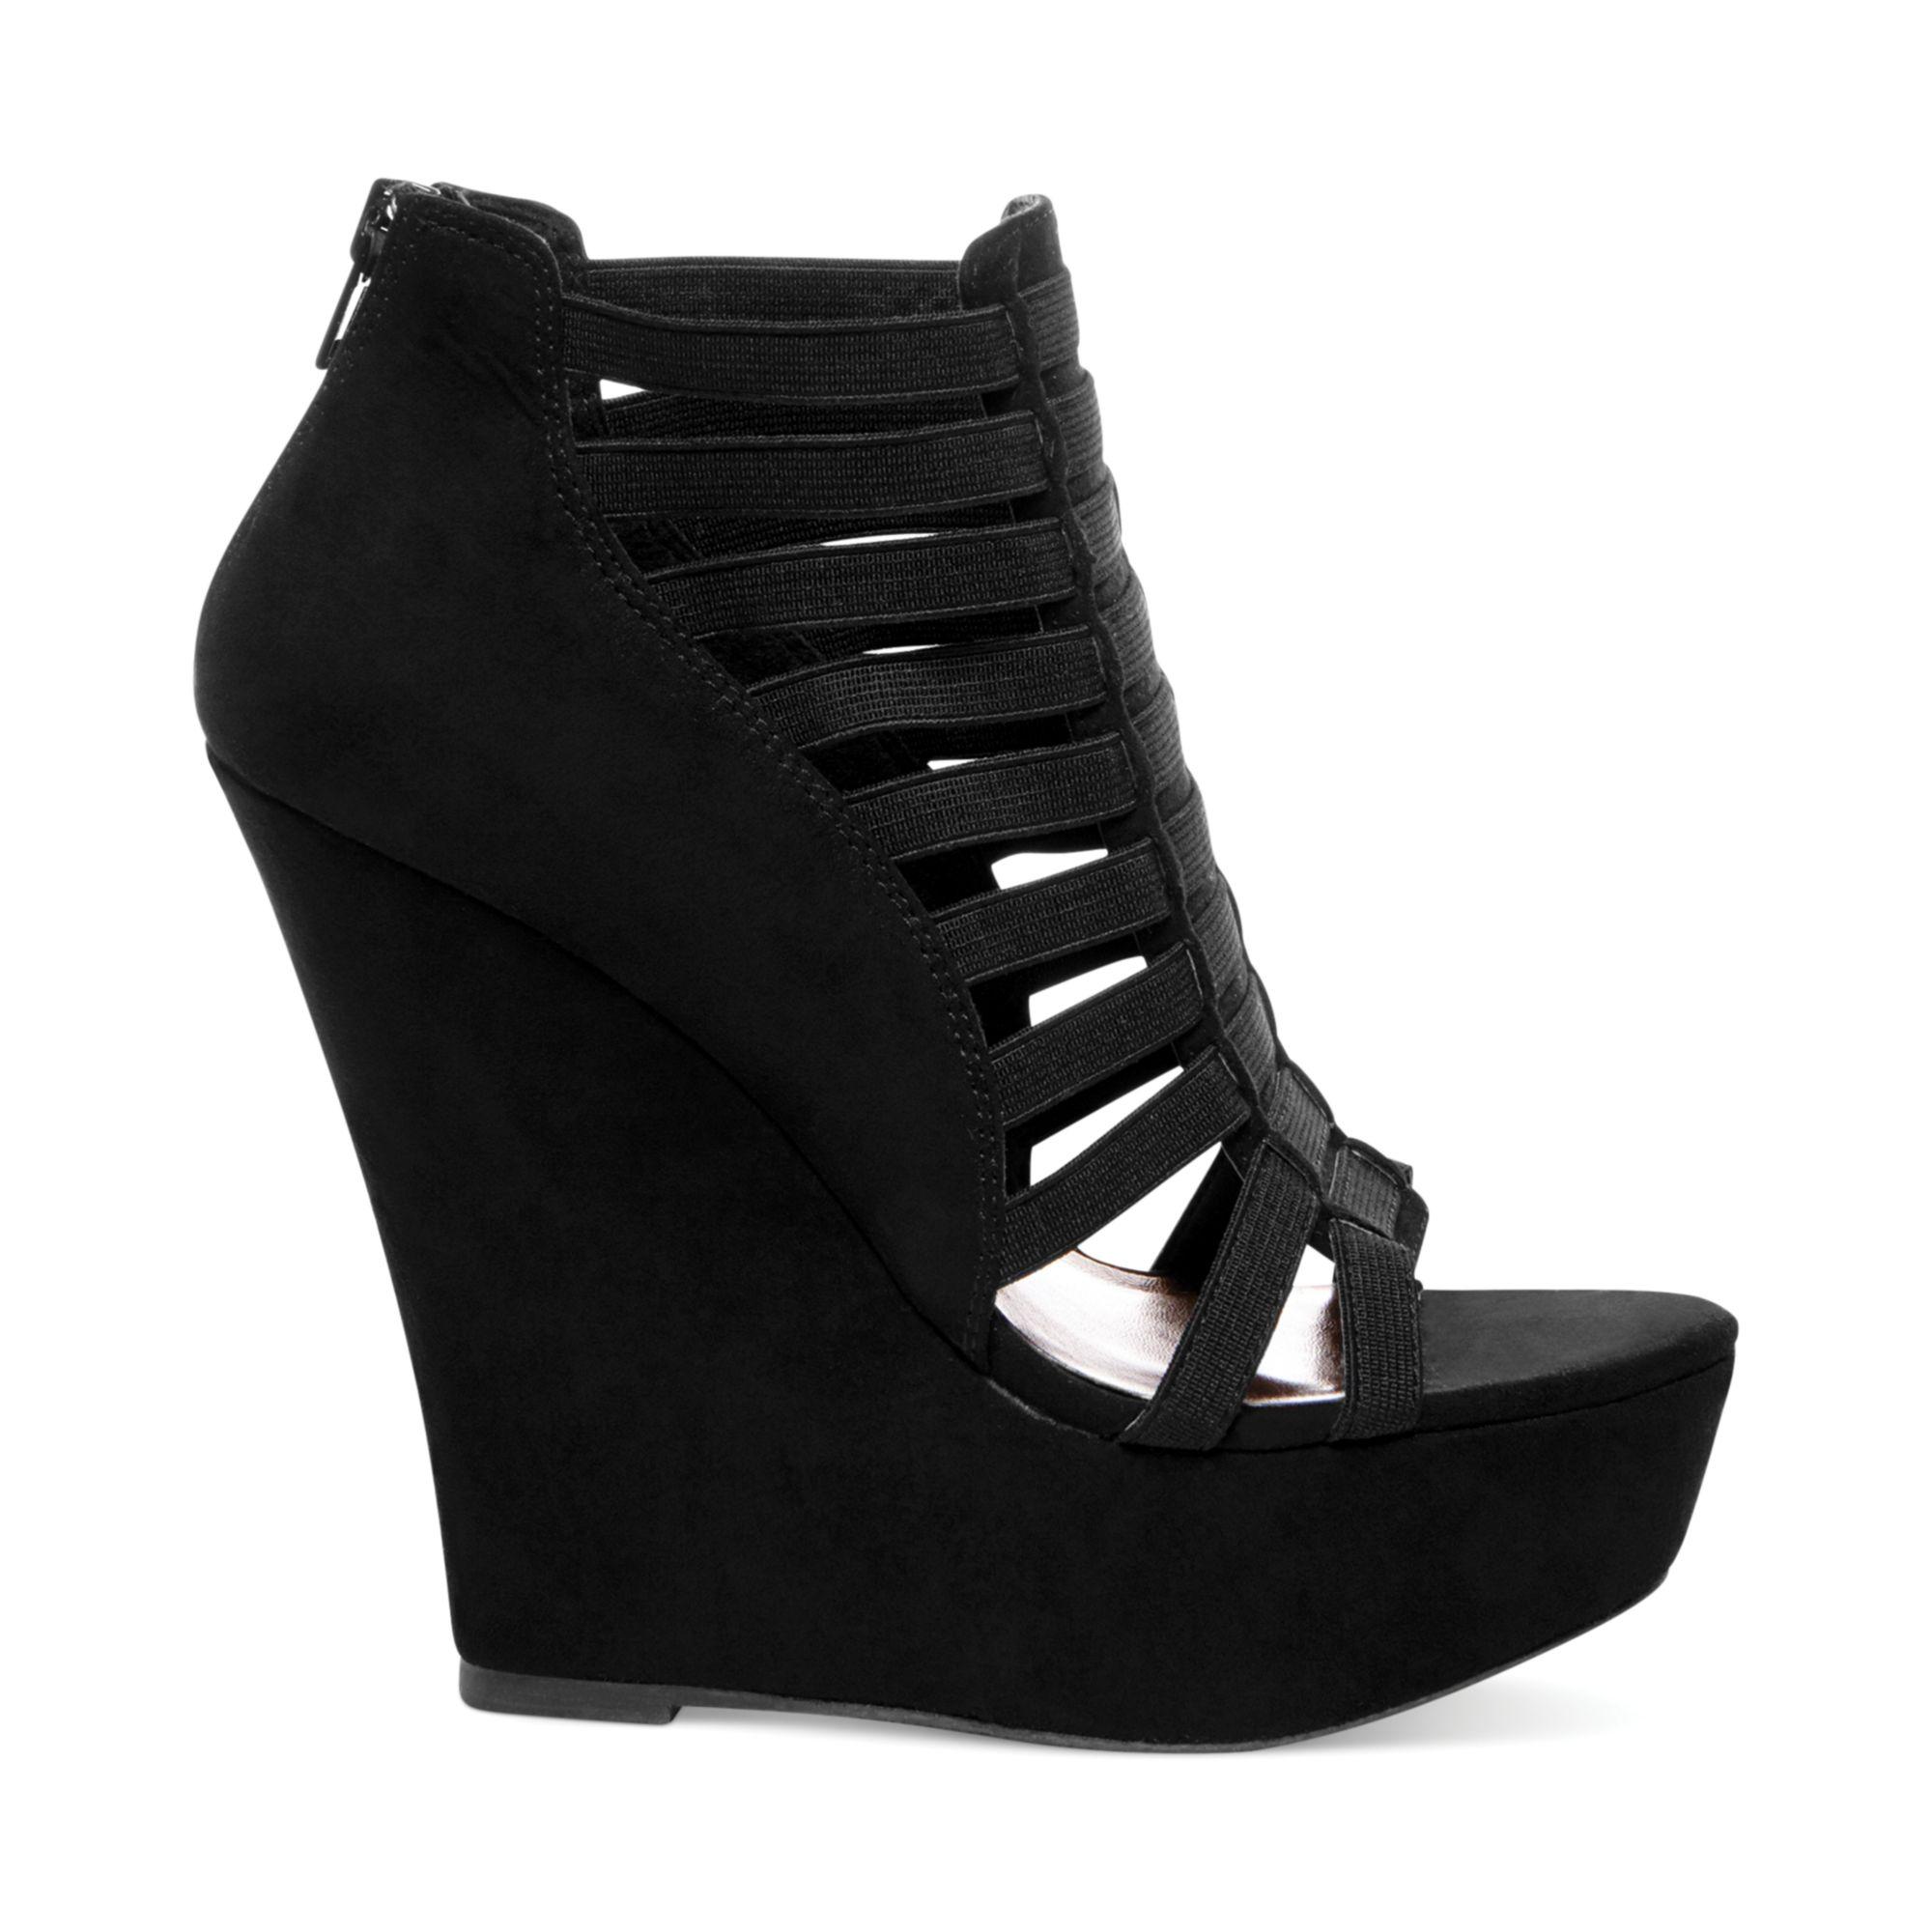 Black Platform Wedge Heels - Is Heel